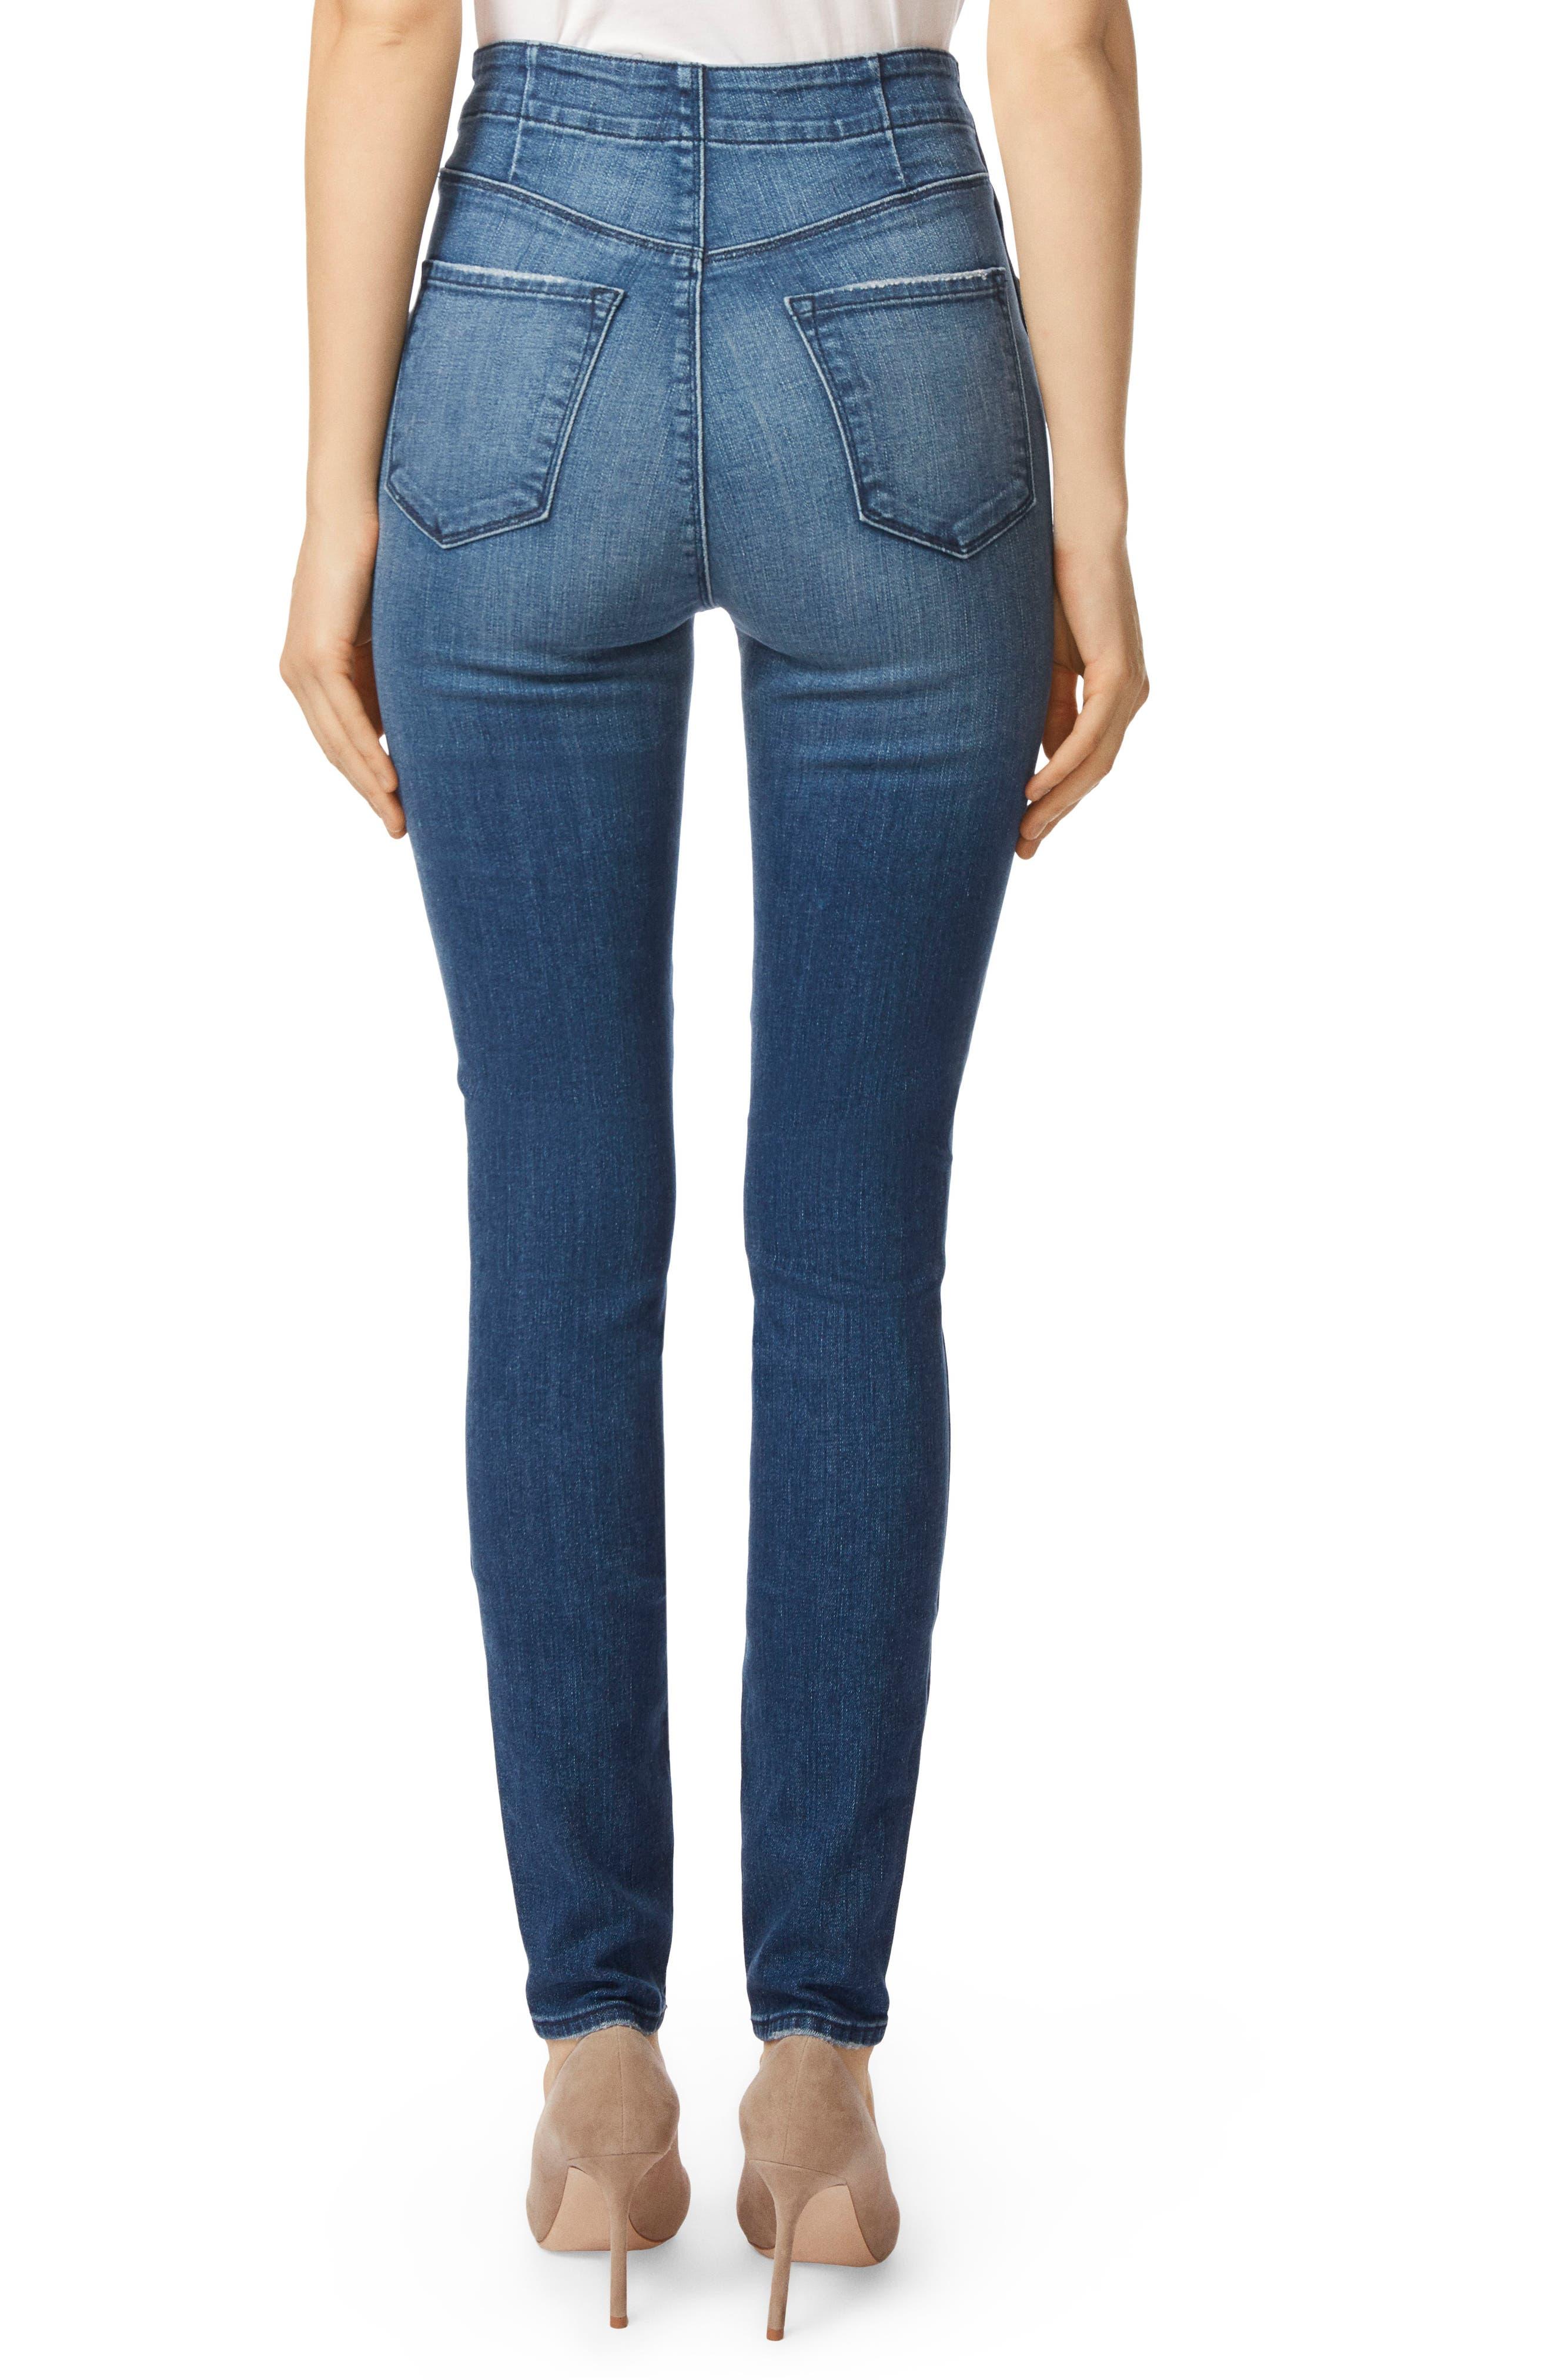 Natasha Sky High High Waist Skinny Jeans,                             Alternate thumbnail 2, color,                             234